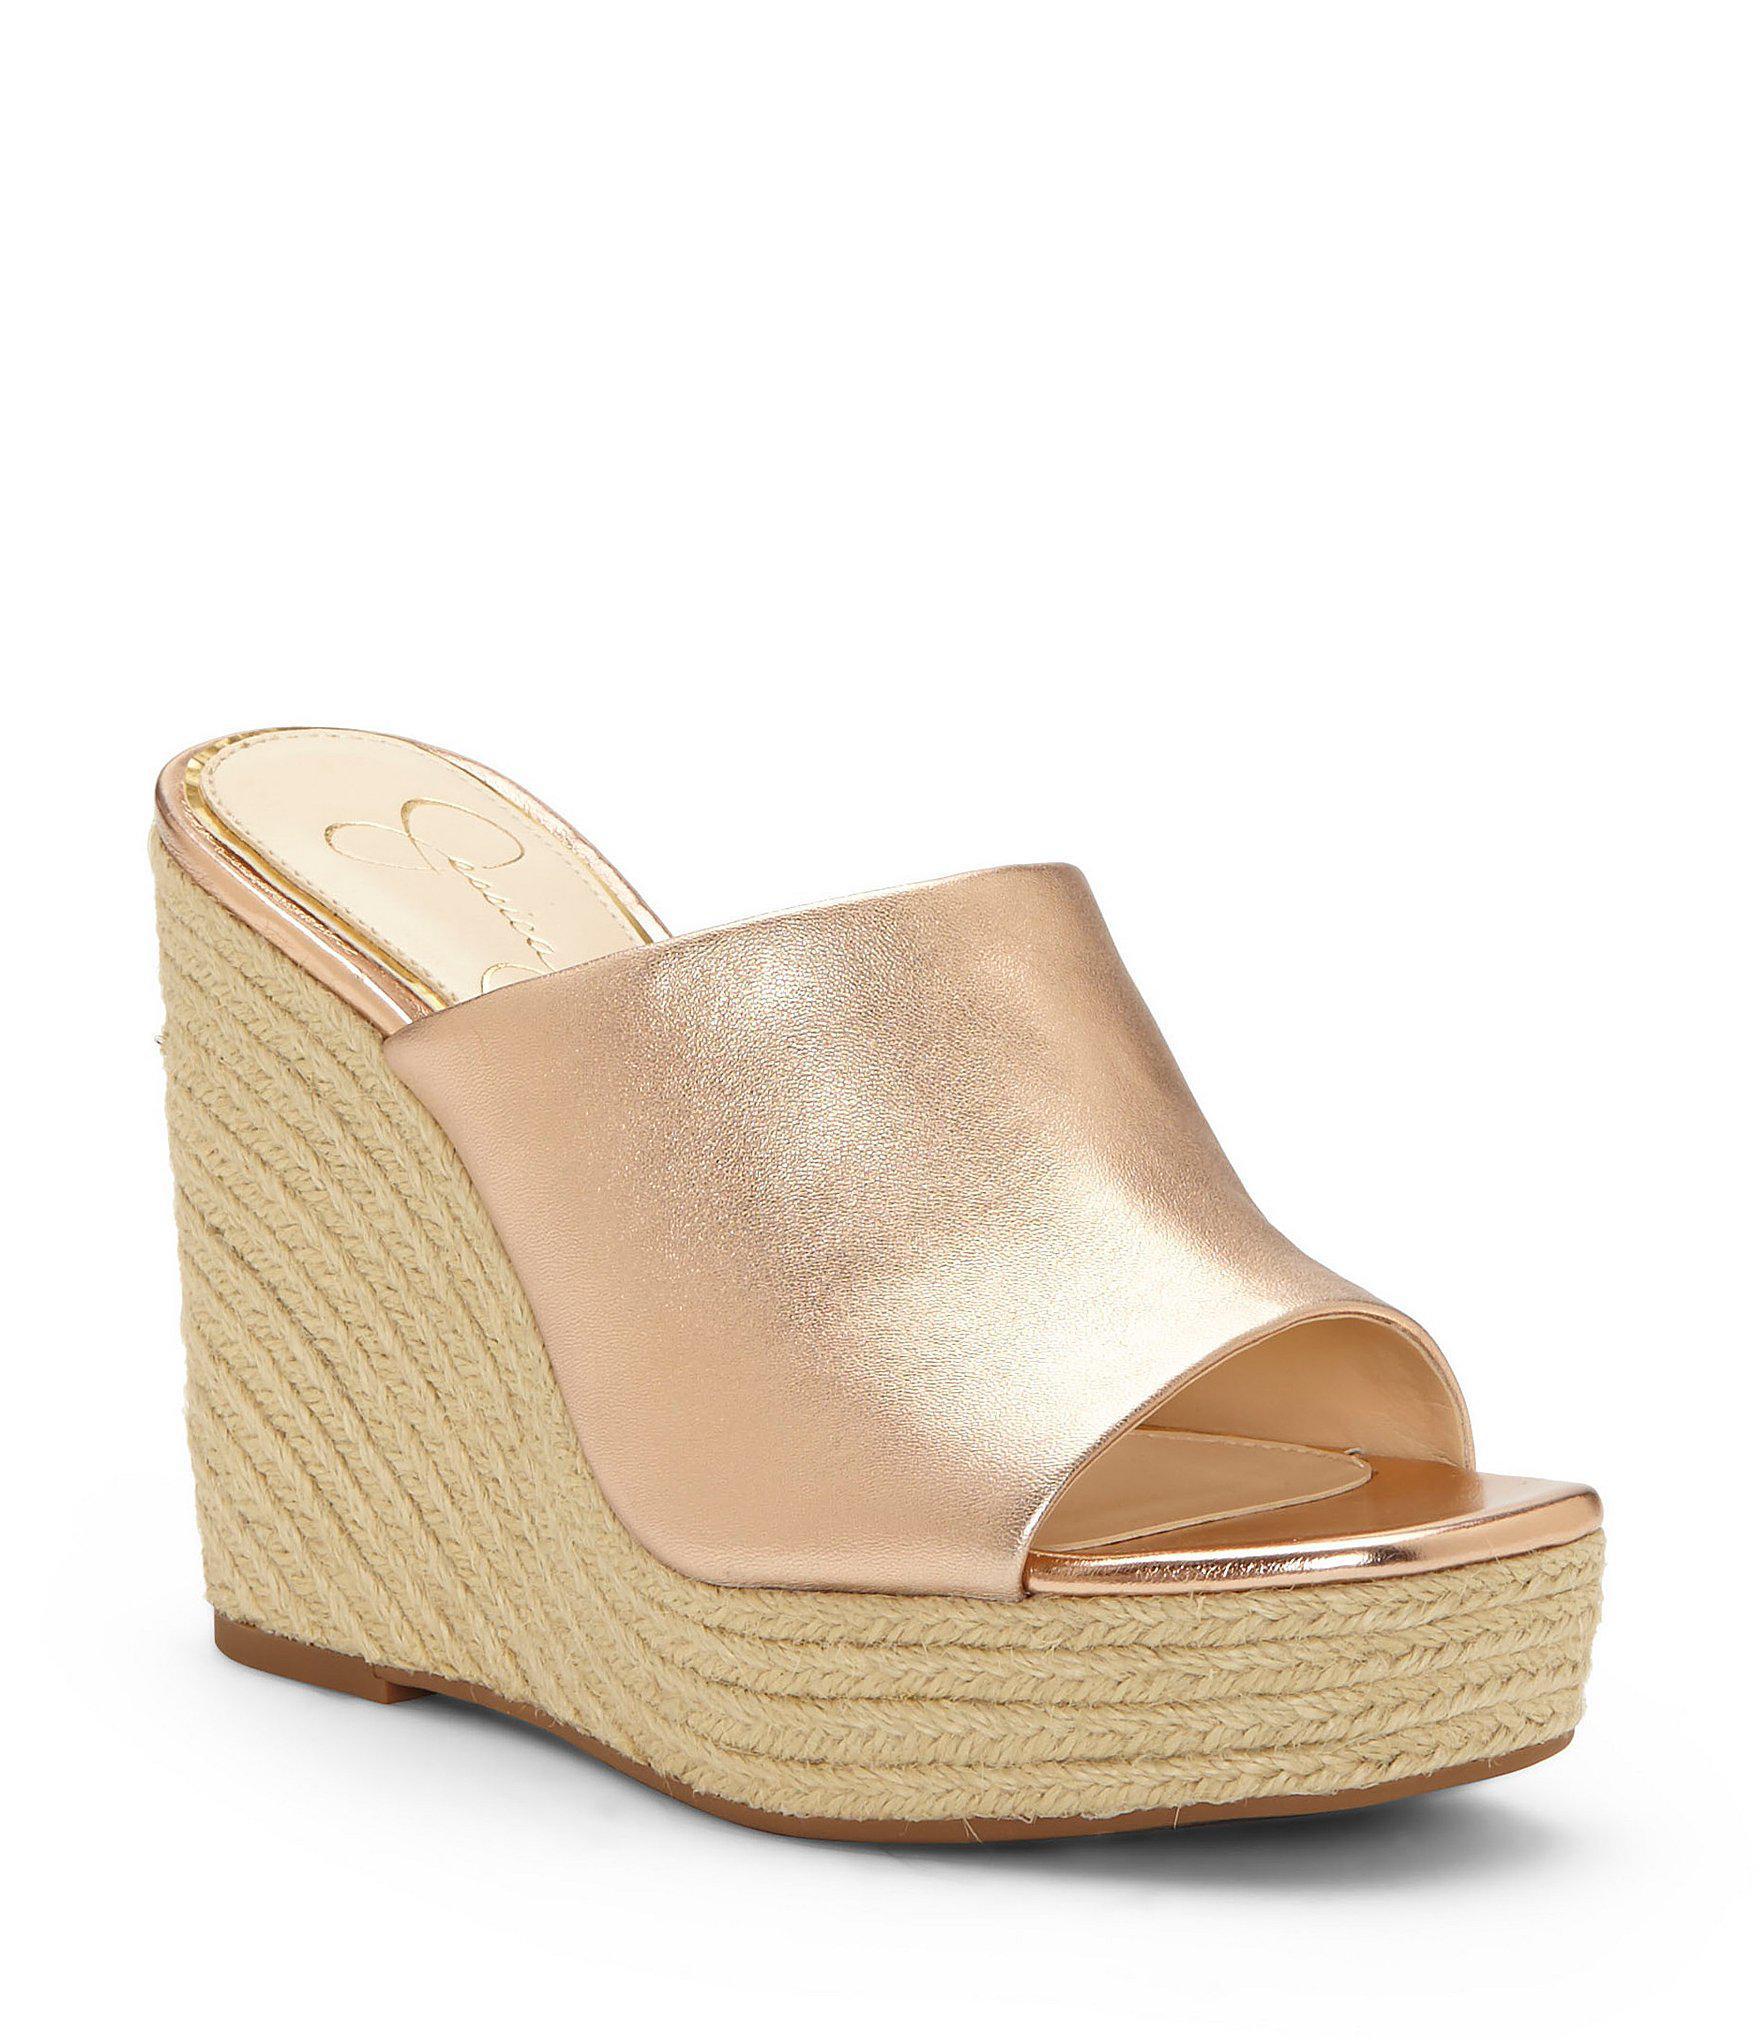 051835f584bb Lyst - Jessica Simpson Sirella Espadrille Wedge Sandals